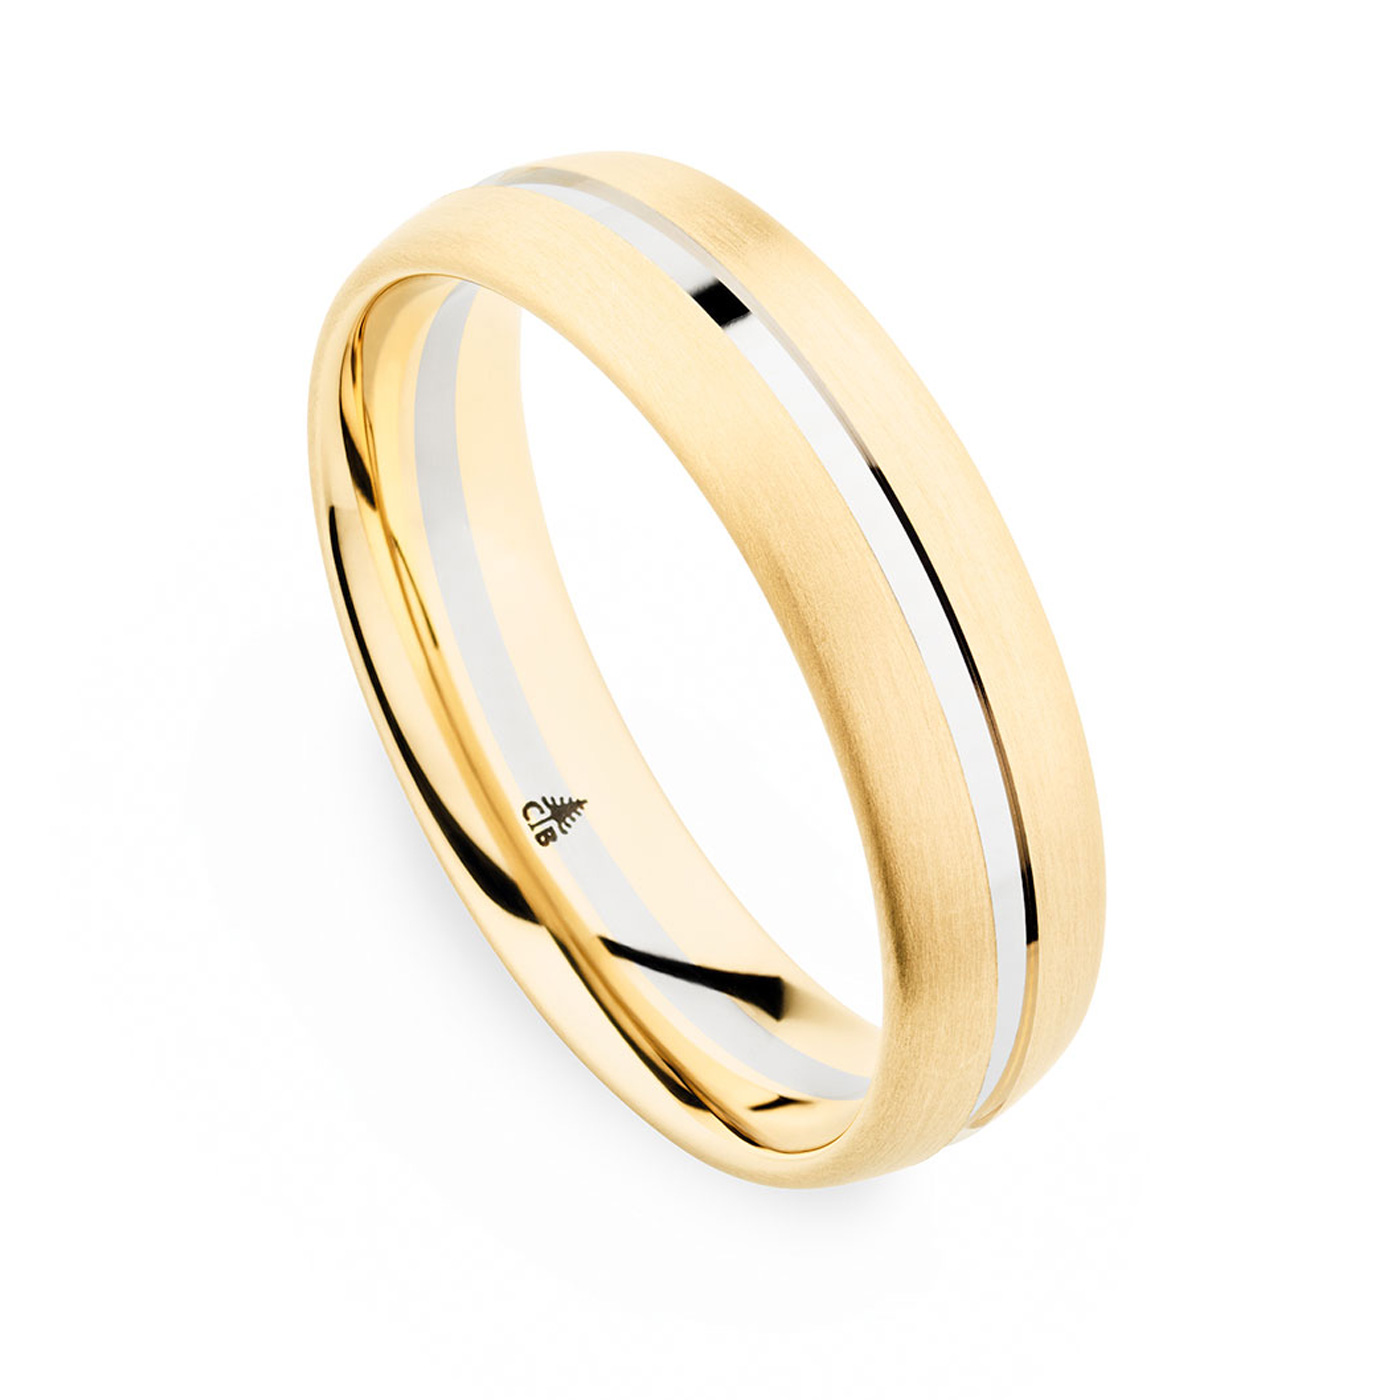 274435 christian bauer palladium 18 karat wedding ring for Christian bauer wedding rings